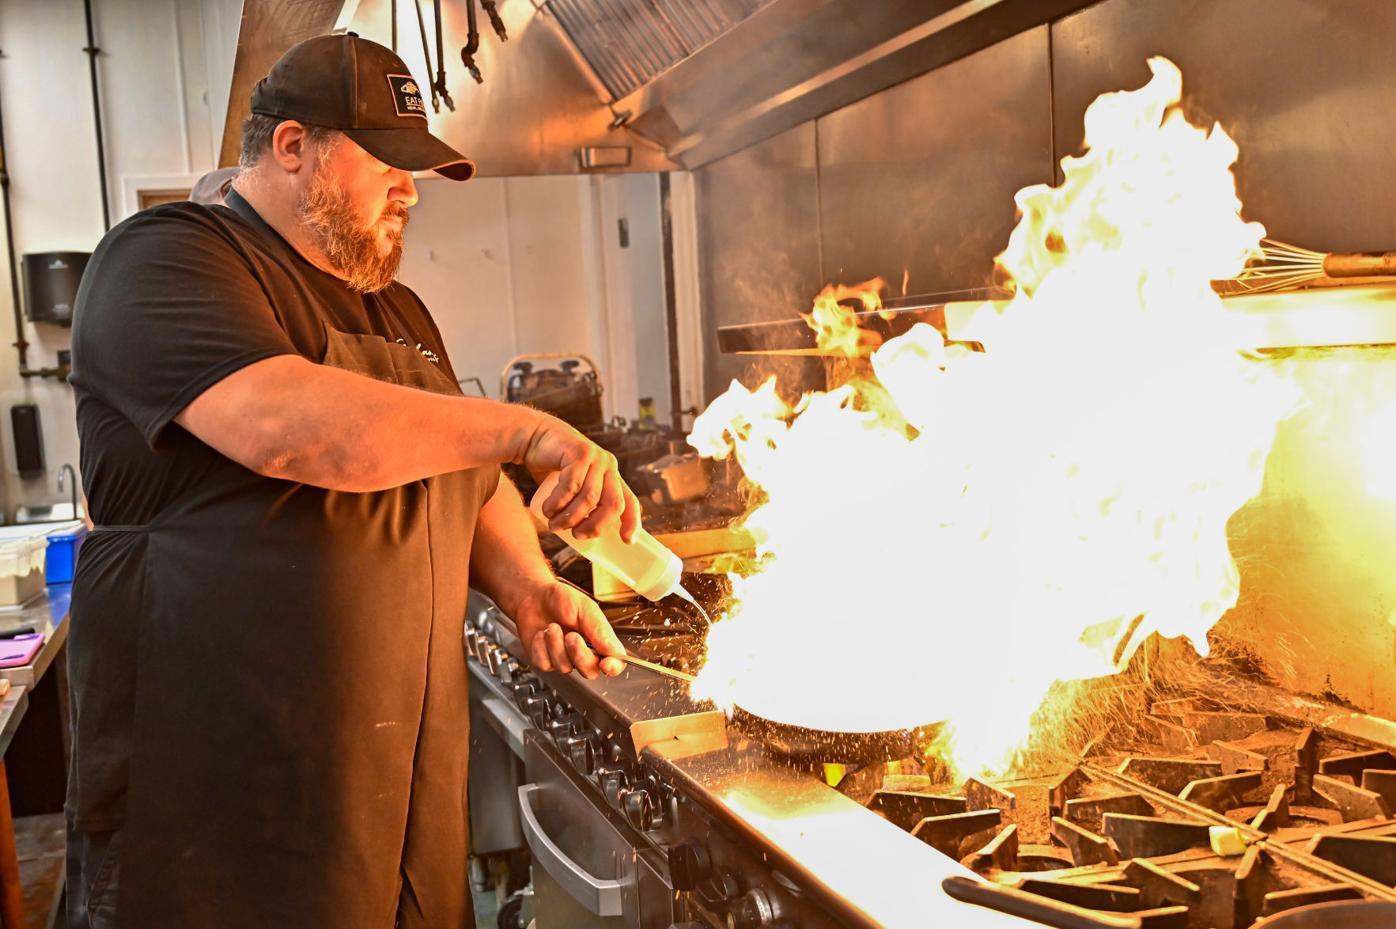 Zachary's chef owner